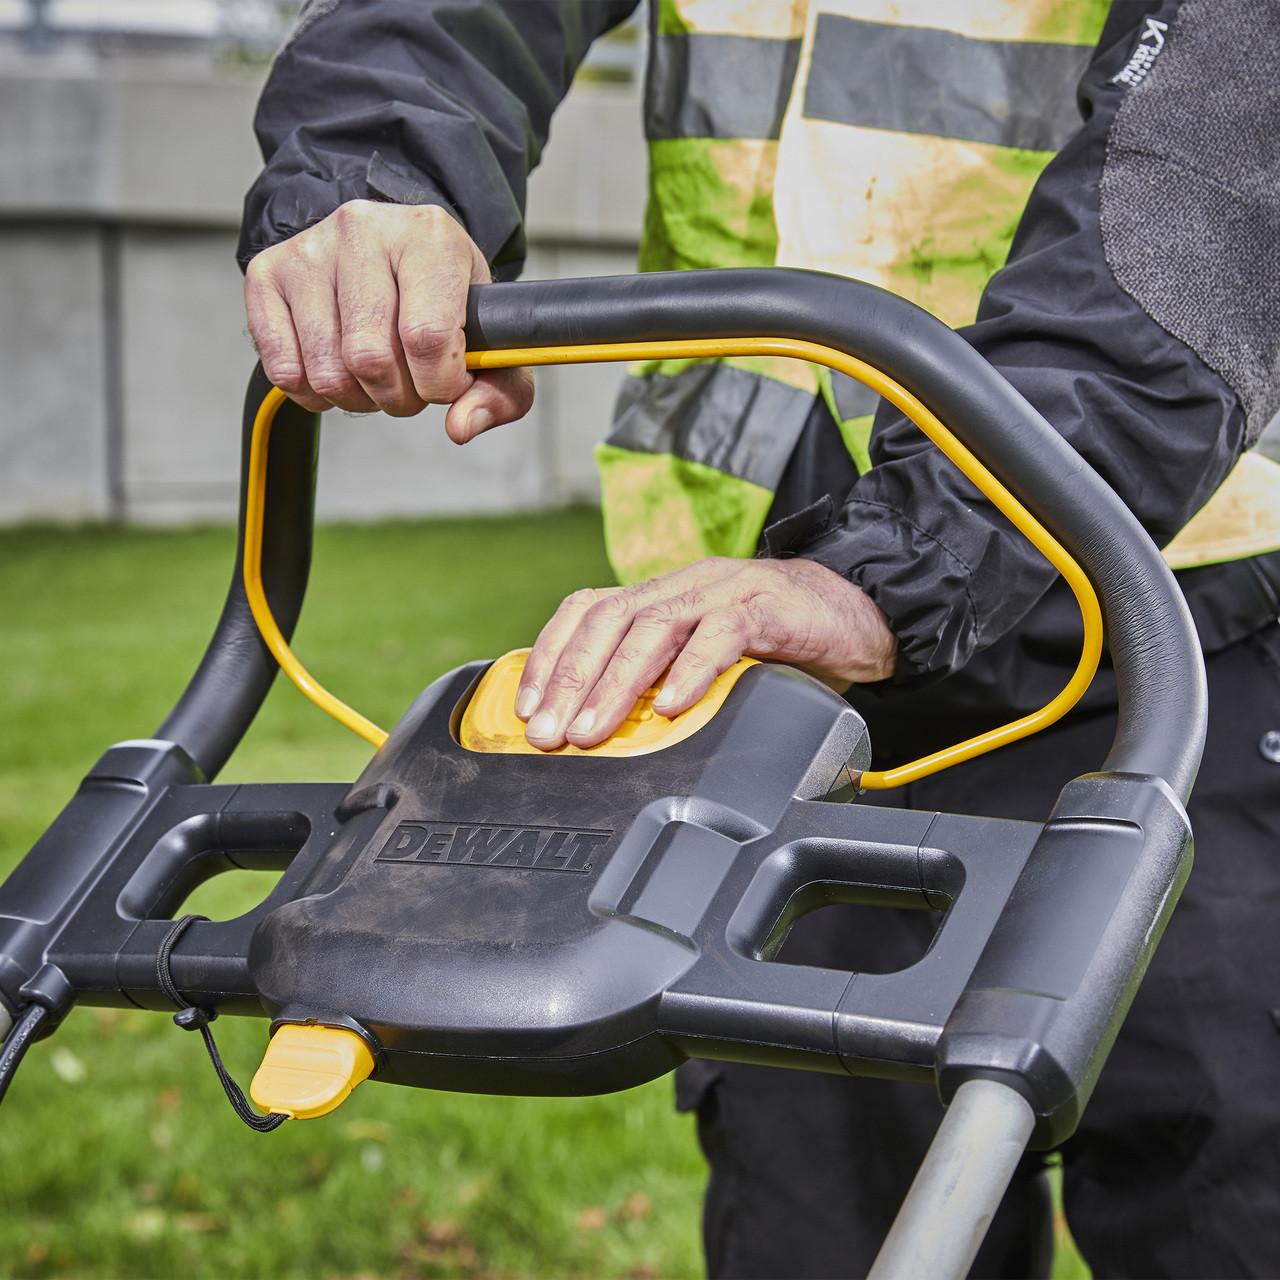 DeWalt DCMW564RN 18v 48cm Brushless Lawnmower (Body Only)